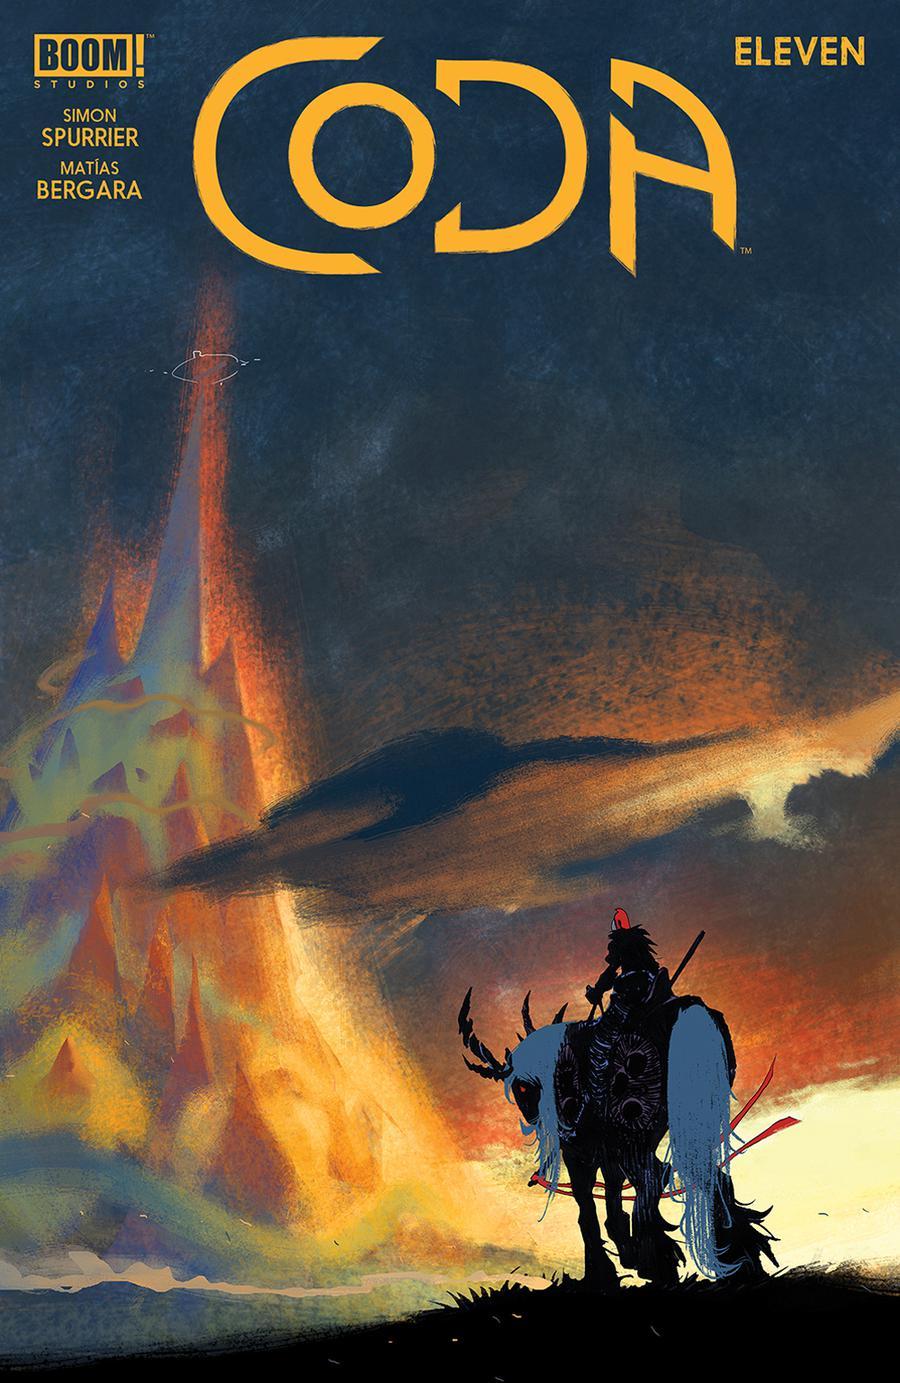 best comic book covers 2019 coda #11 boom! studios